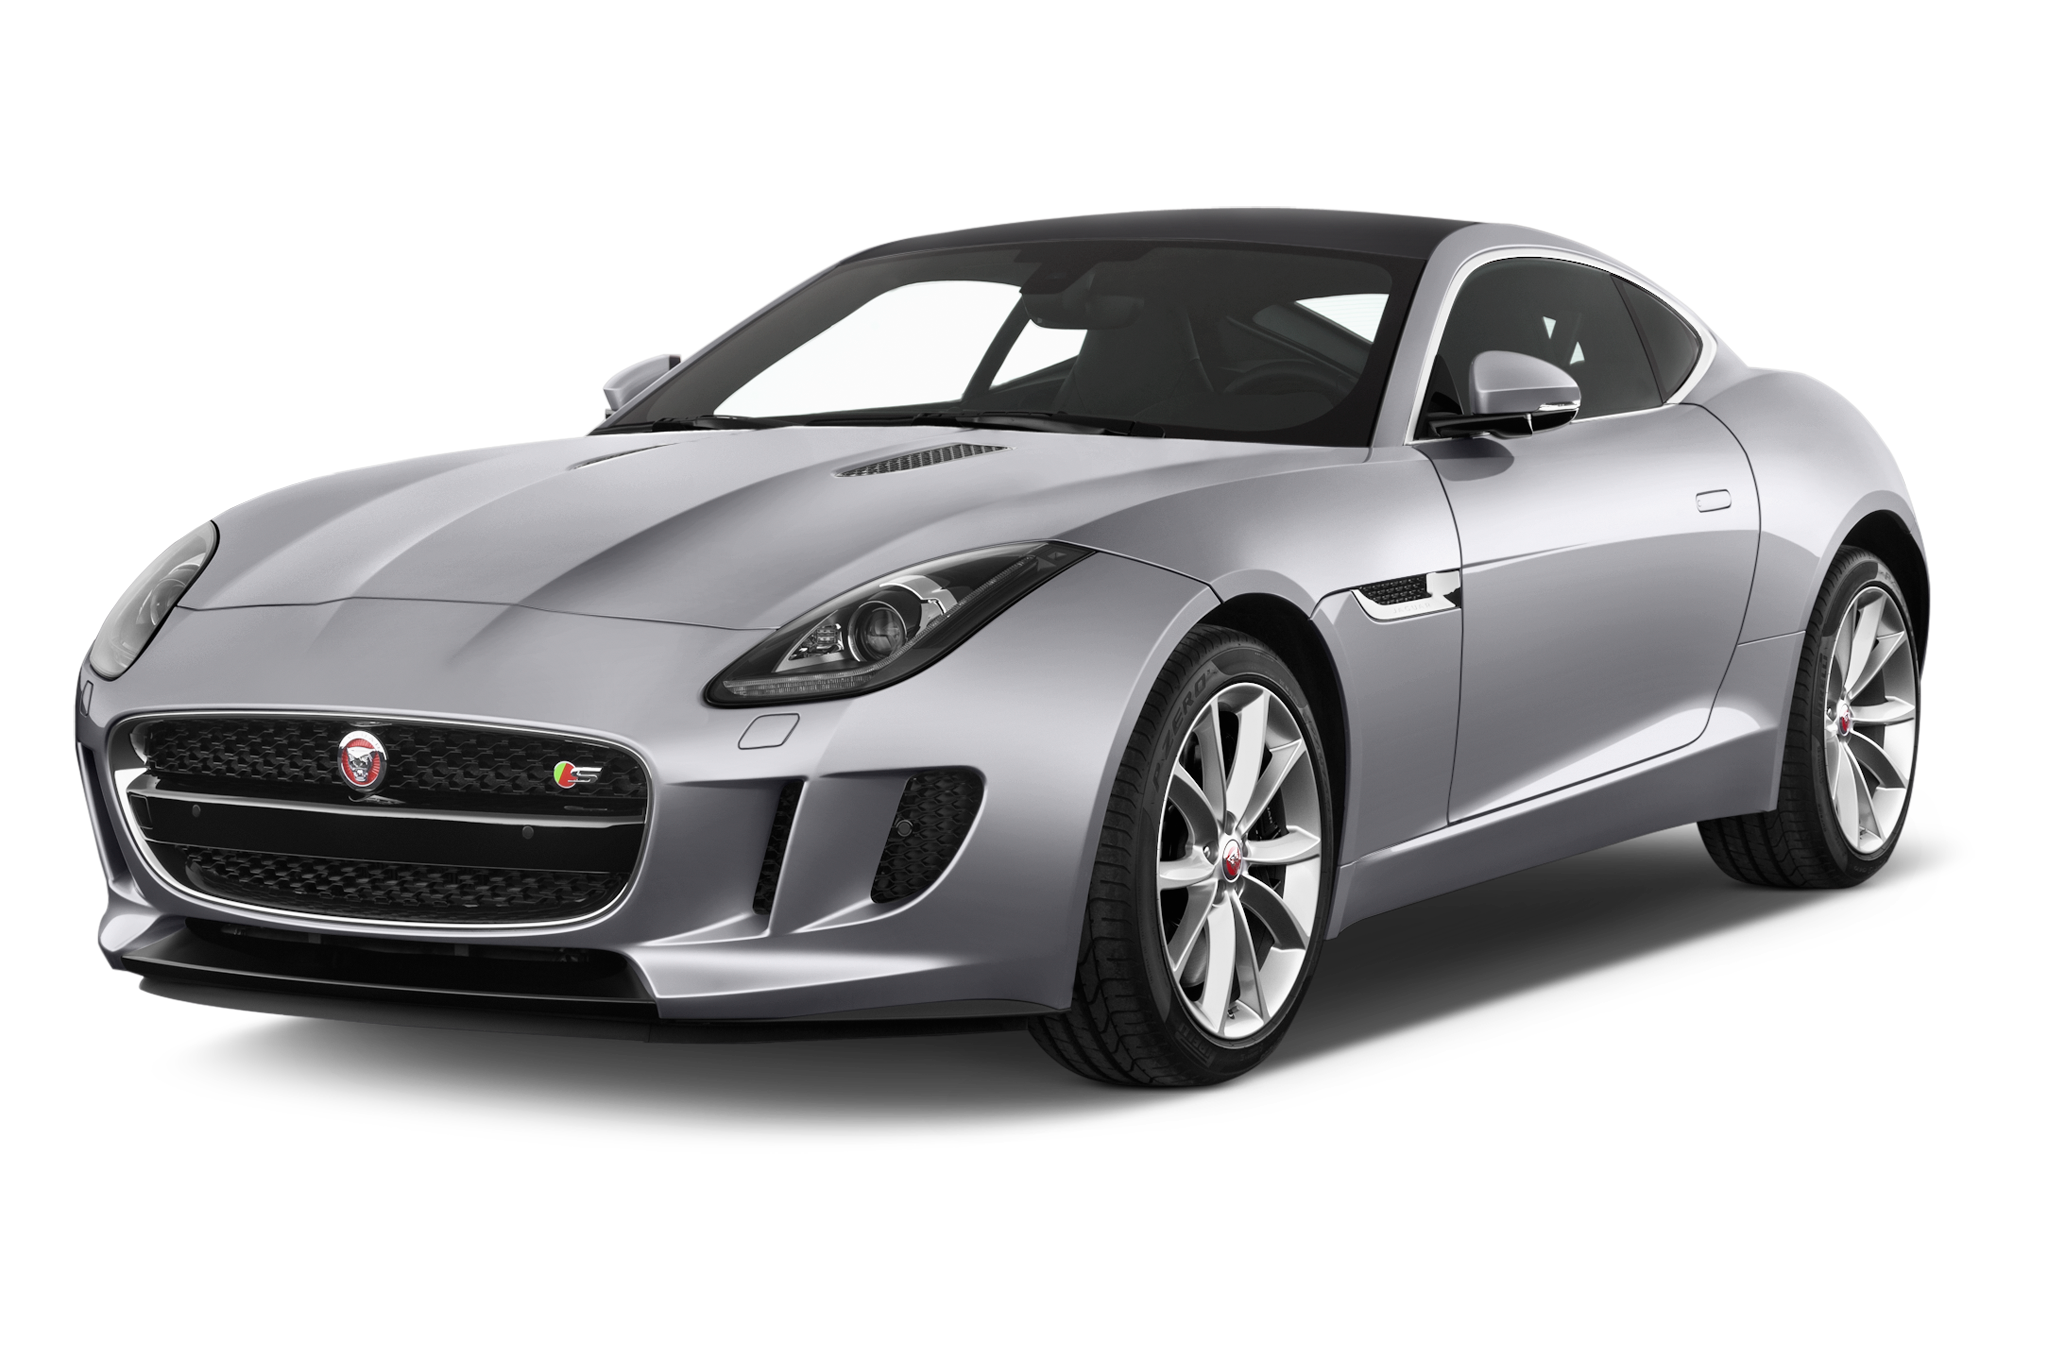 Jaguar car clipart jpg library Jaguar PNG Images Transparent Free Download | PNGMart.com jpg library